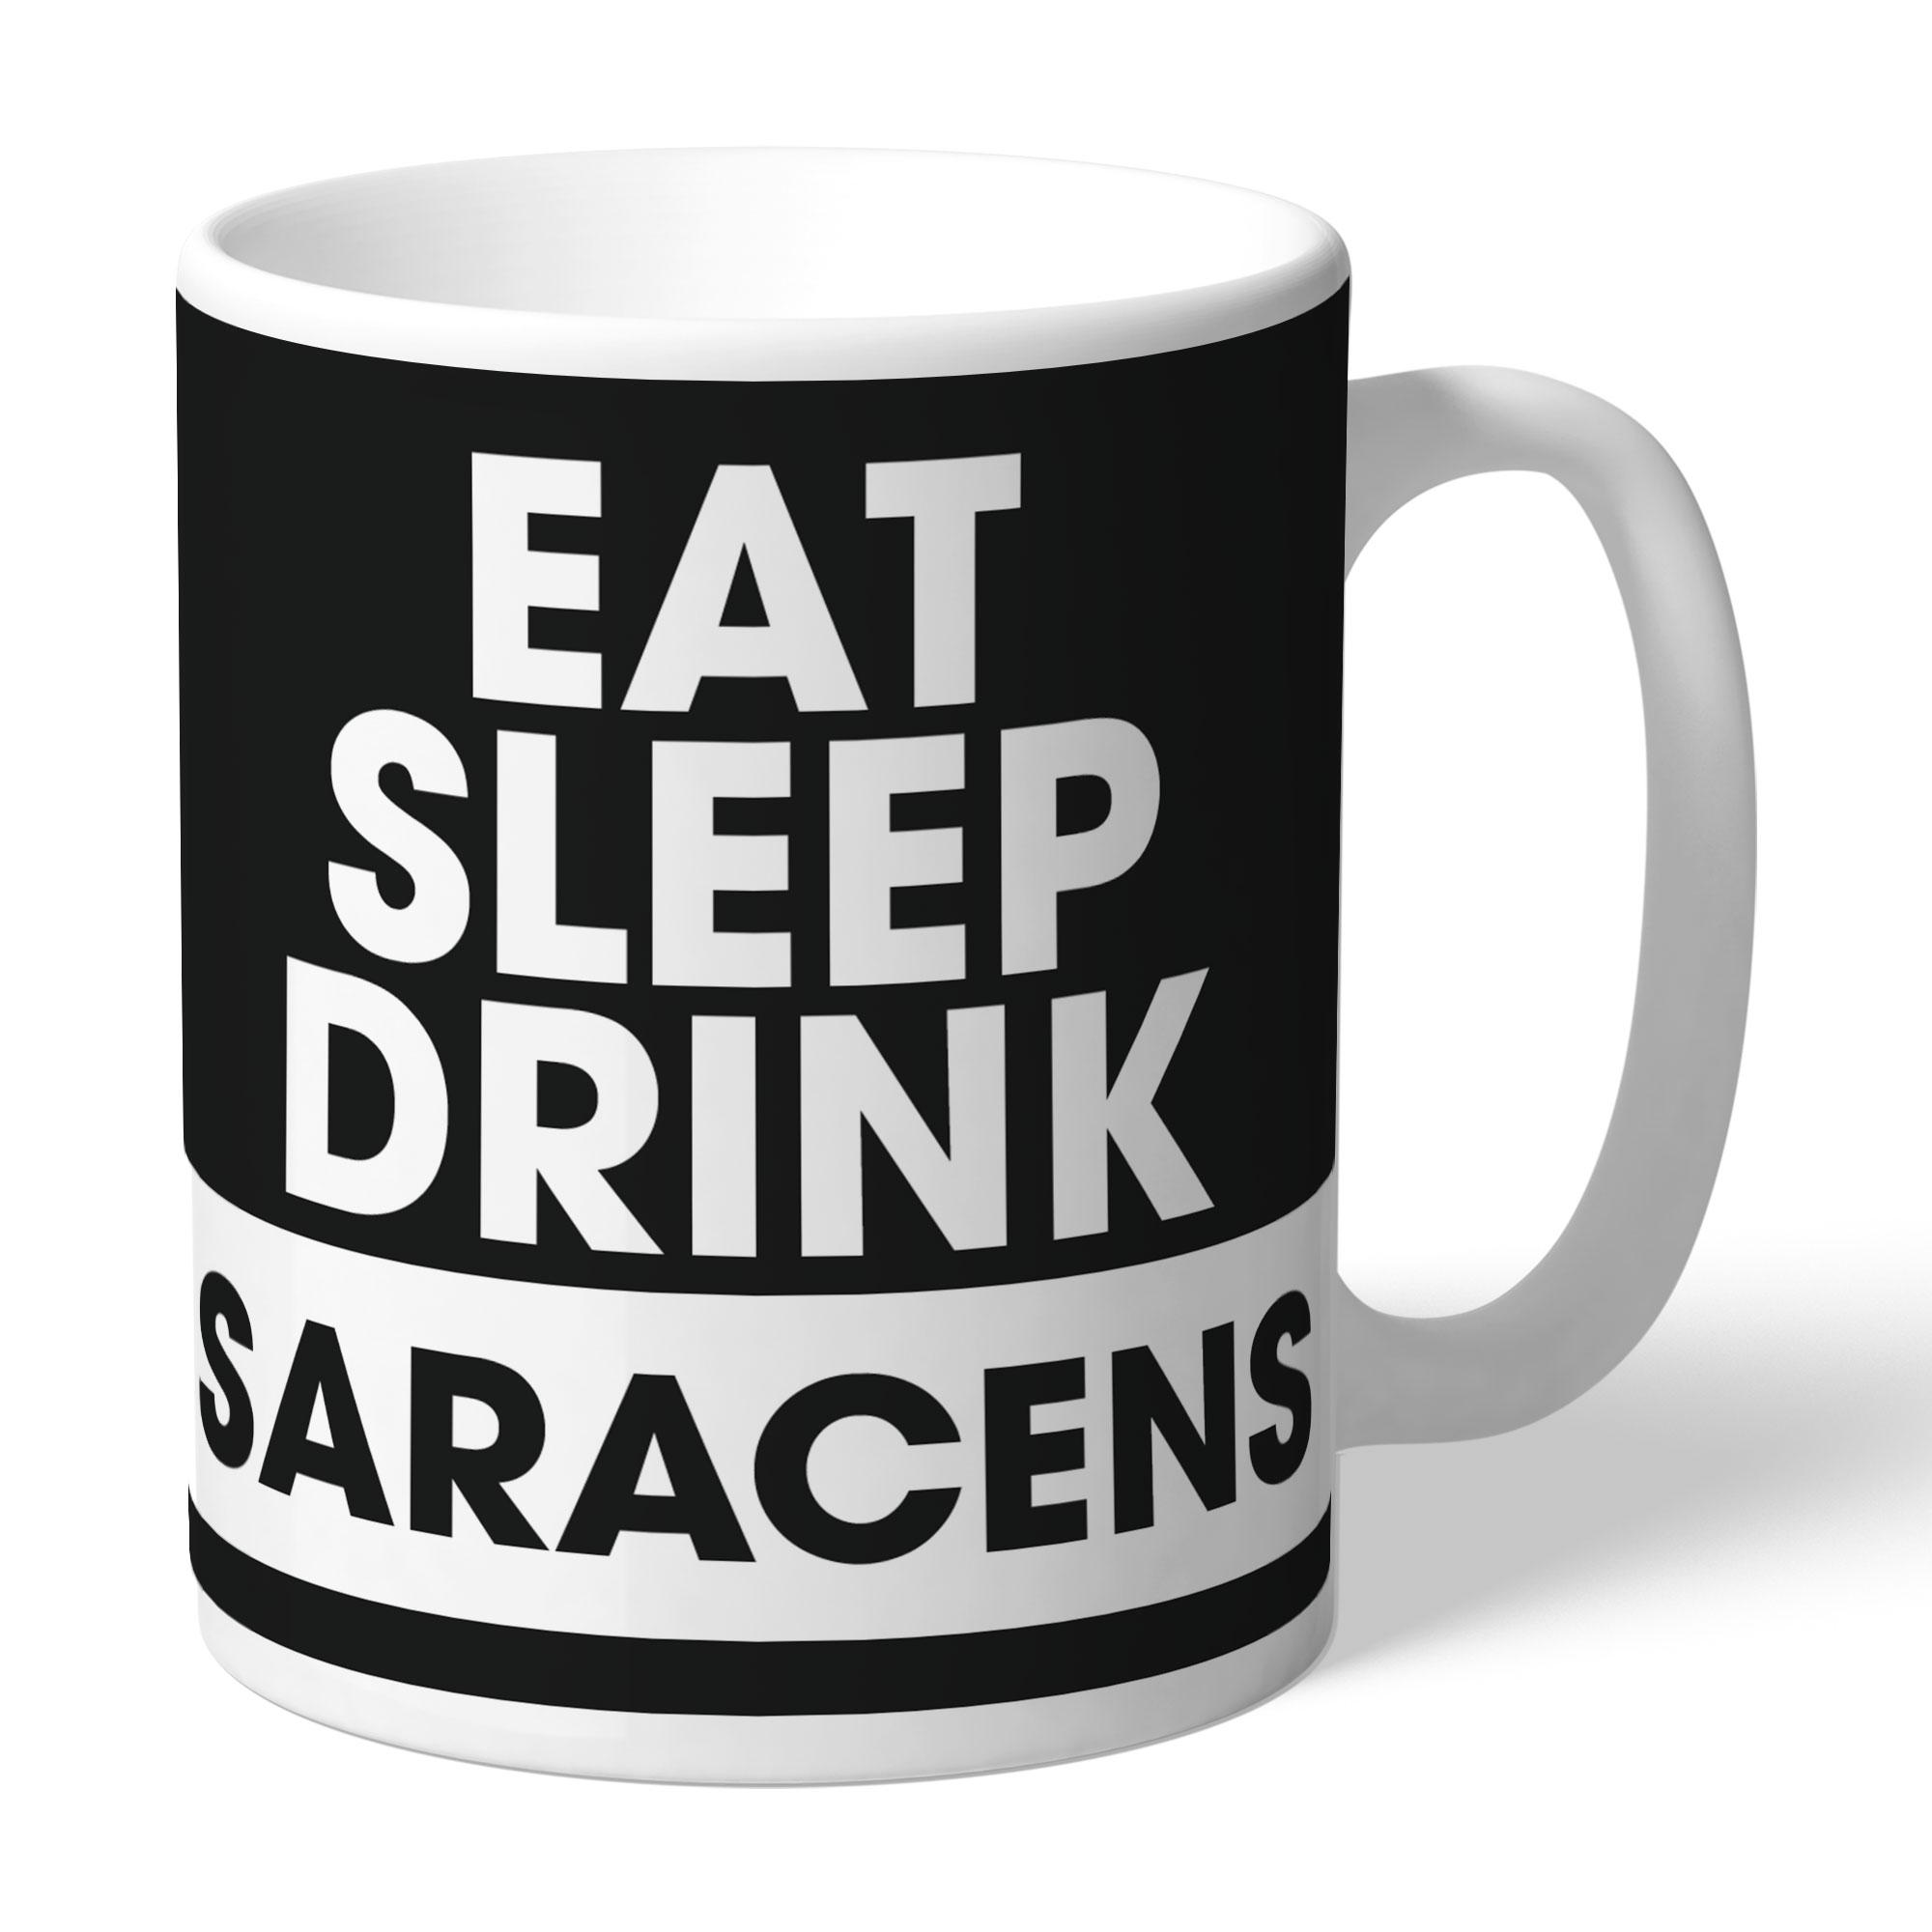 Saracens Eat Sleep Drink Mug